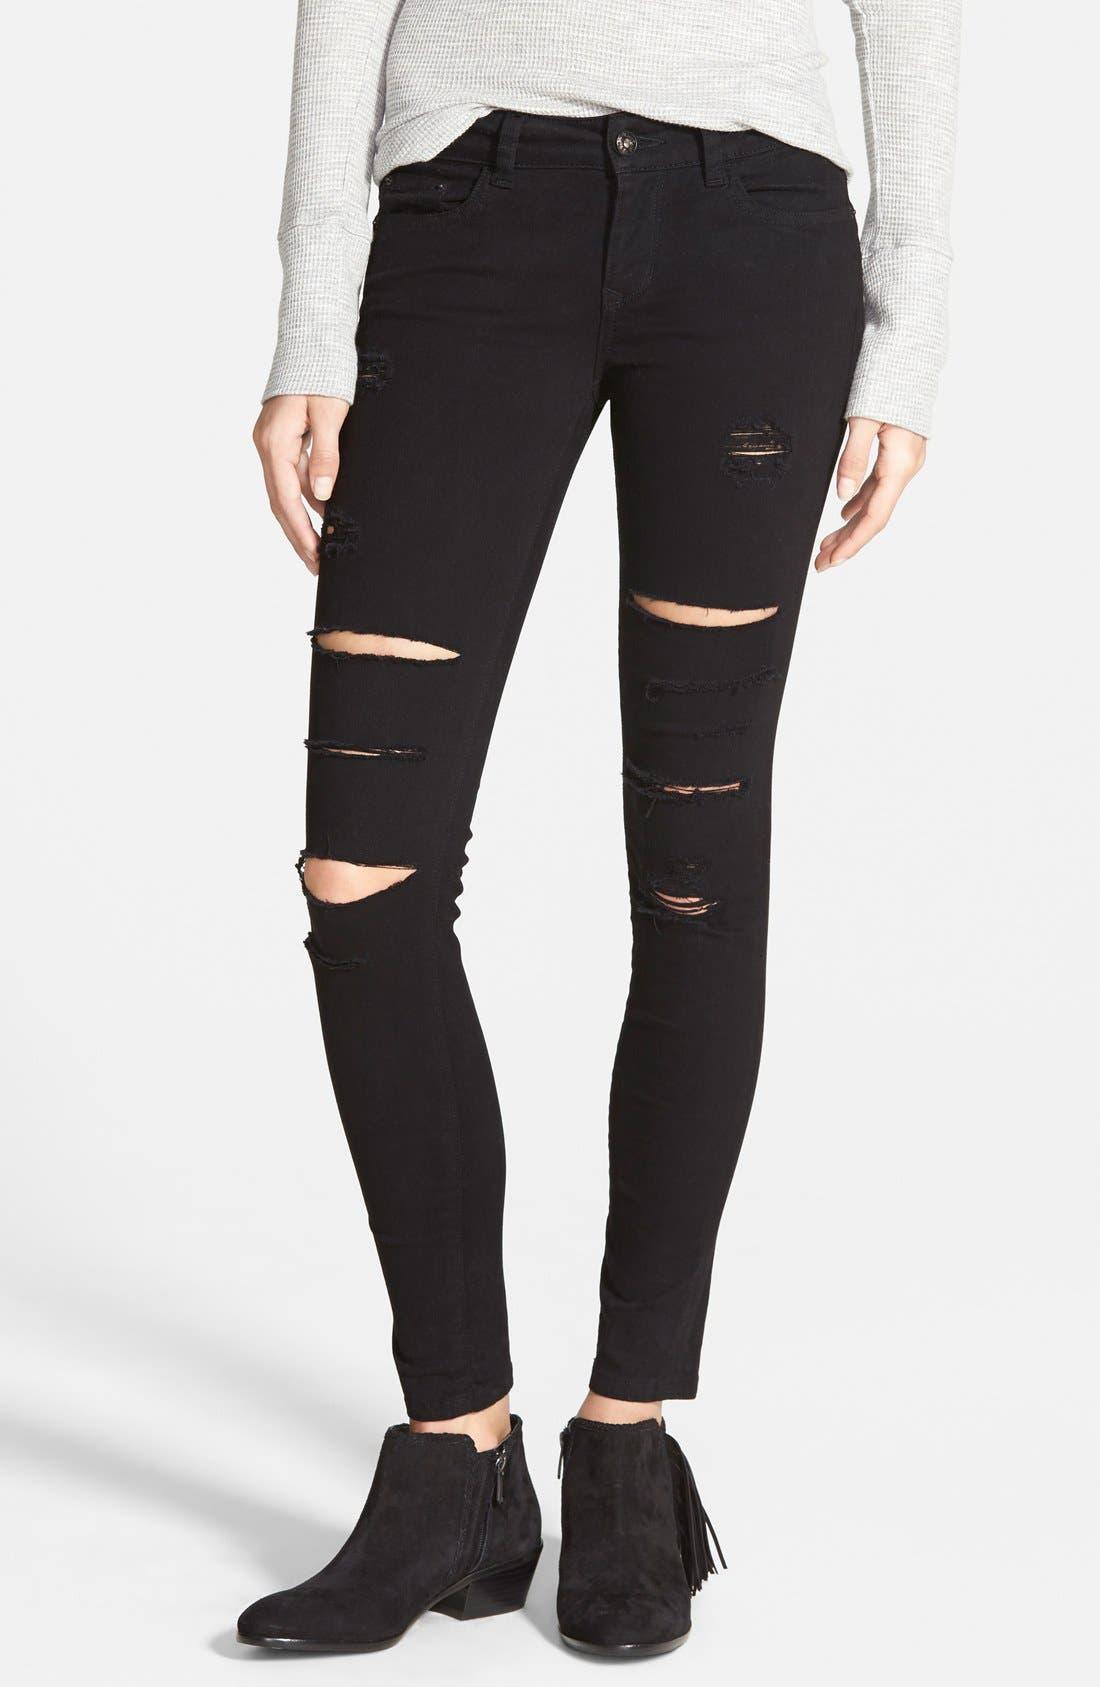 Alternate Image 1 Selected - SP Black Destroyed Low Rise Skinny Jeans (Black) (Online Only)